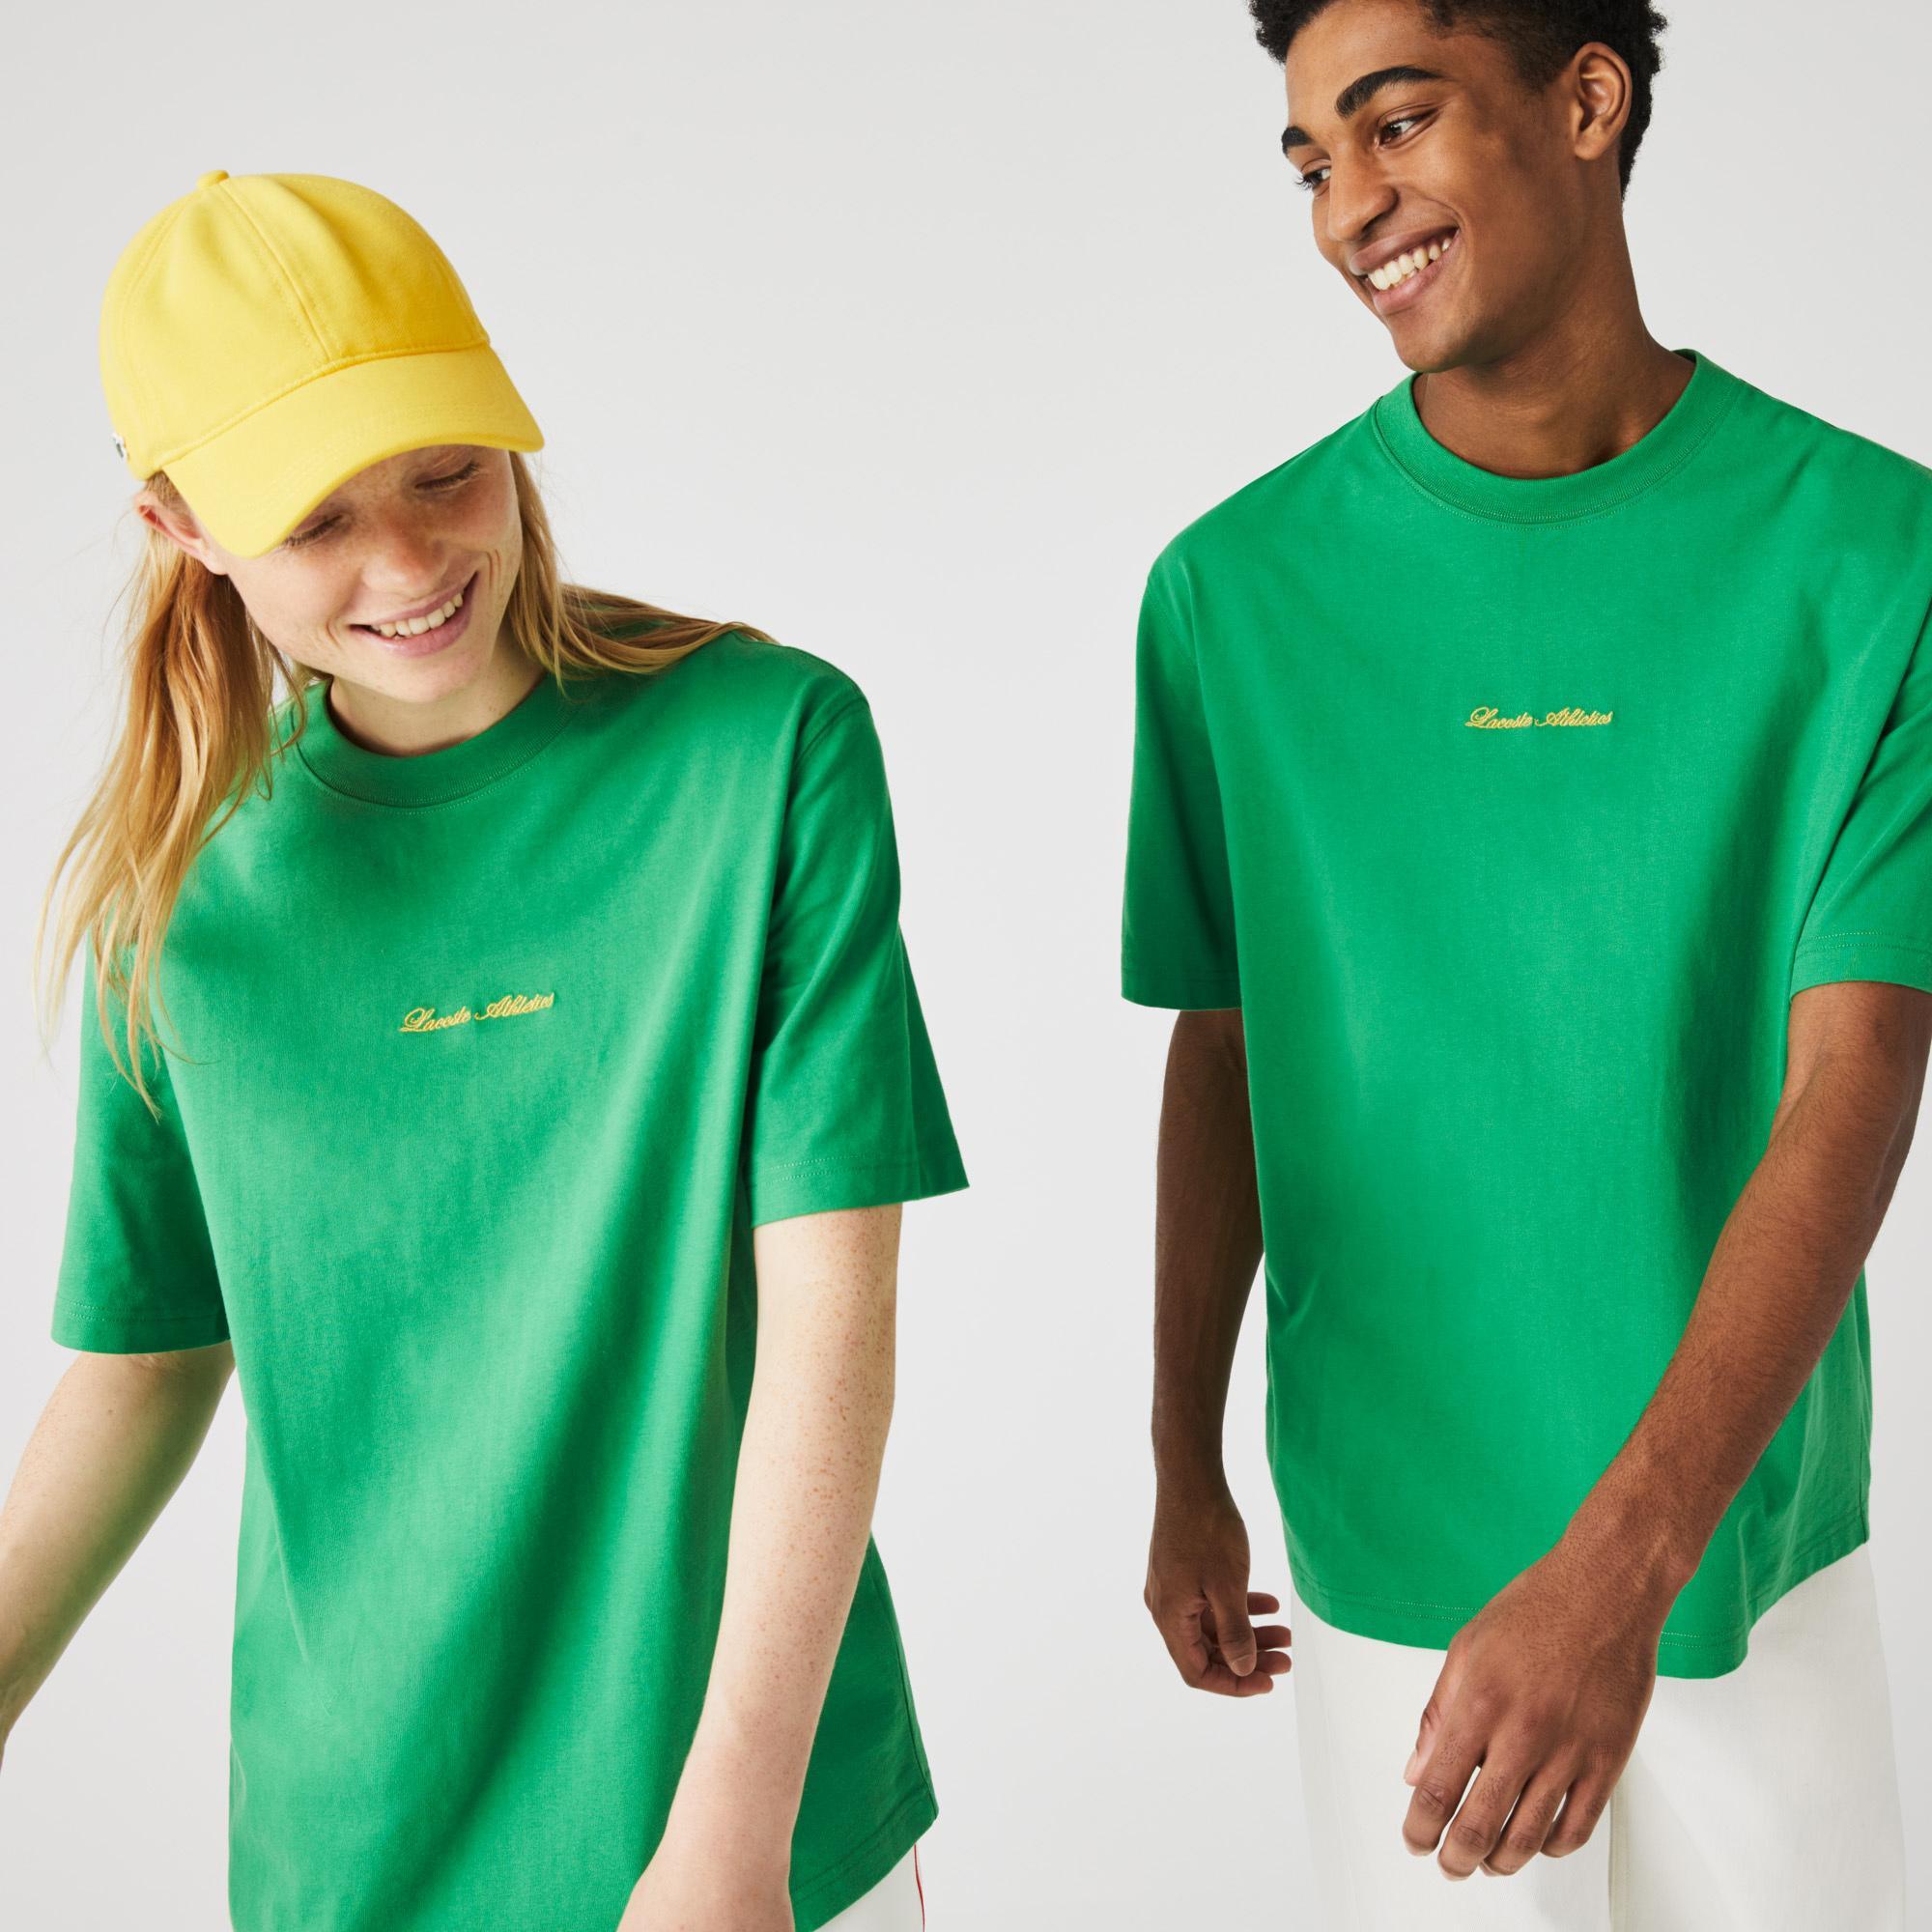 Lacoste L!ve Unisex Loose Fit Bisiklet Yaka Baskılı Yeşil T-Shirt